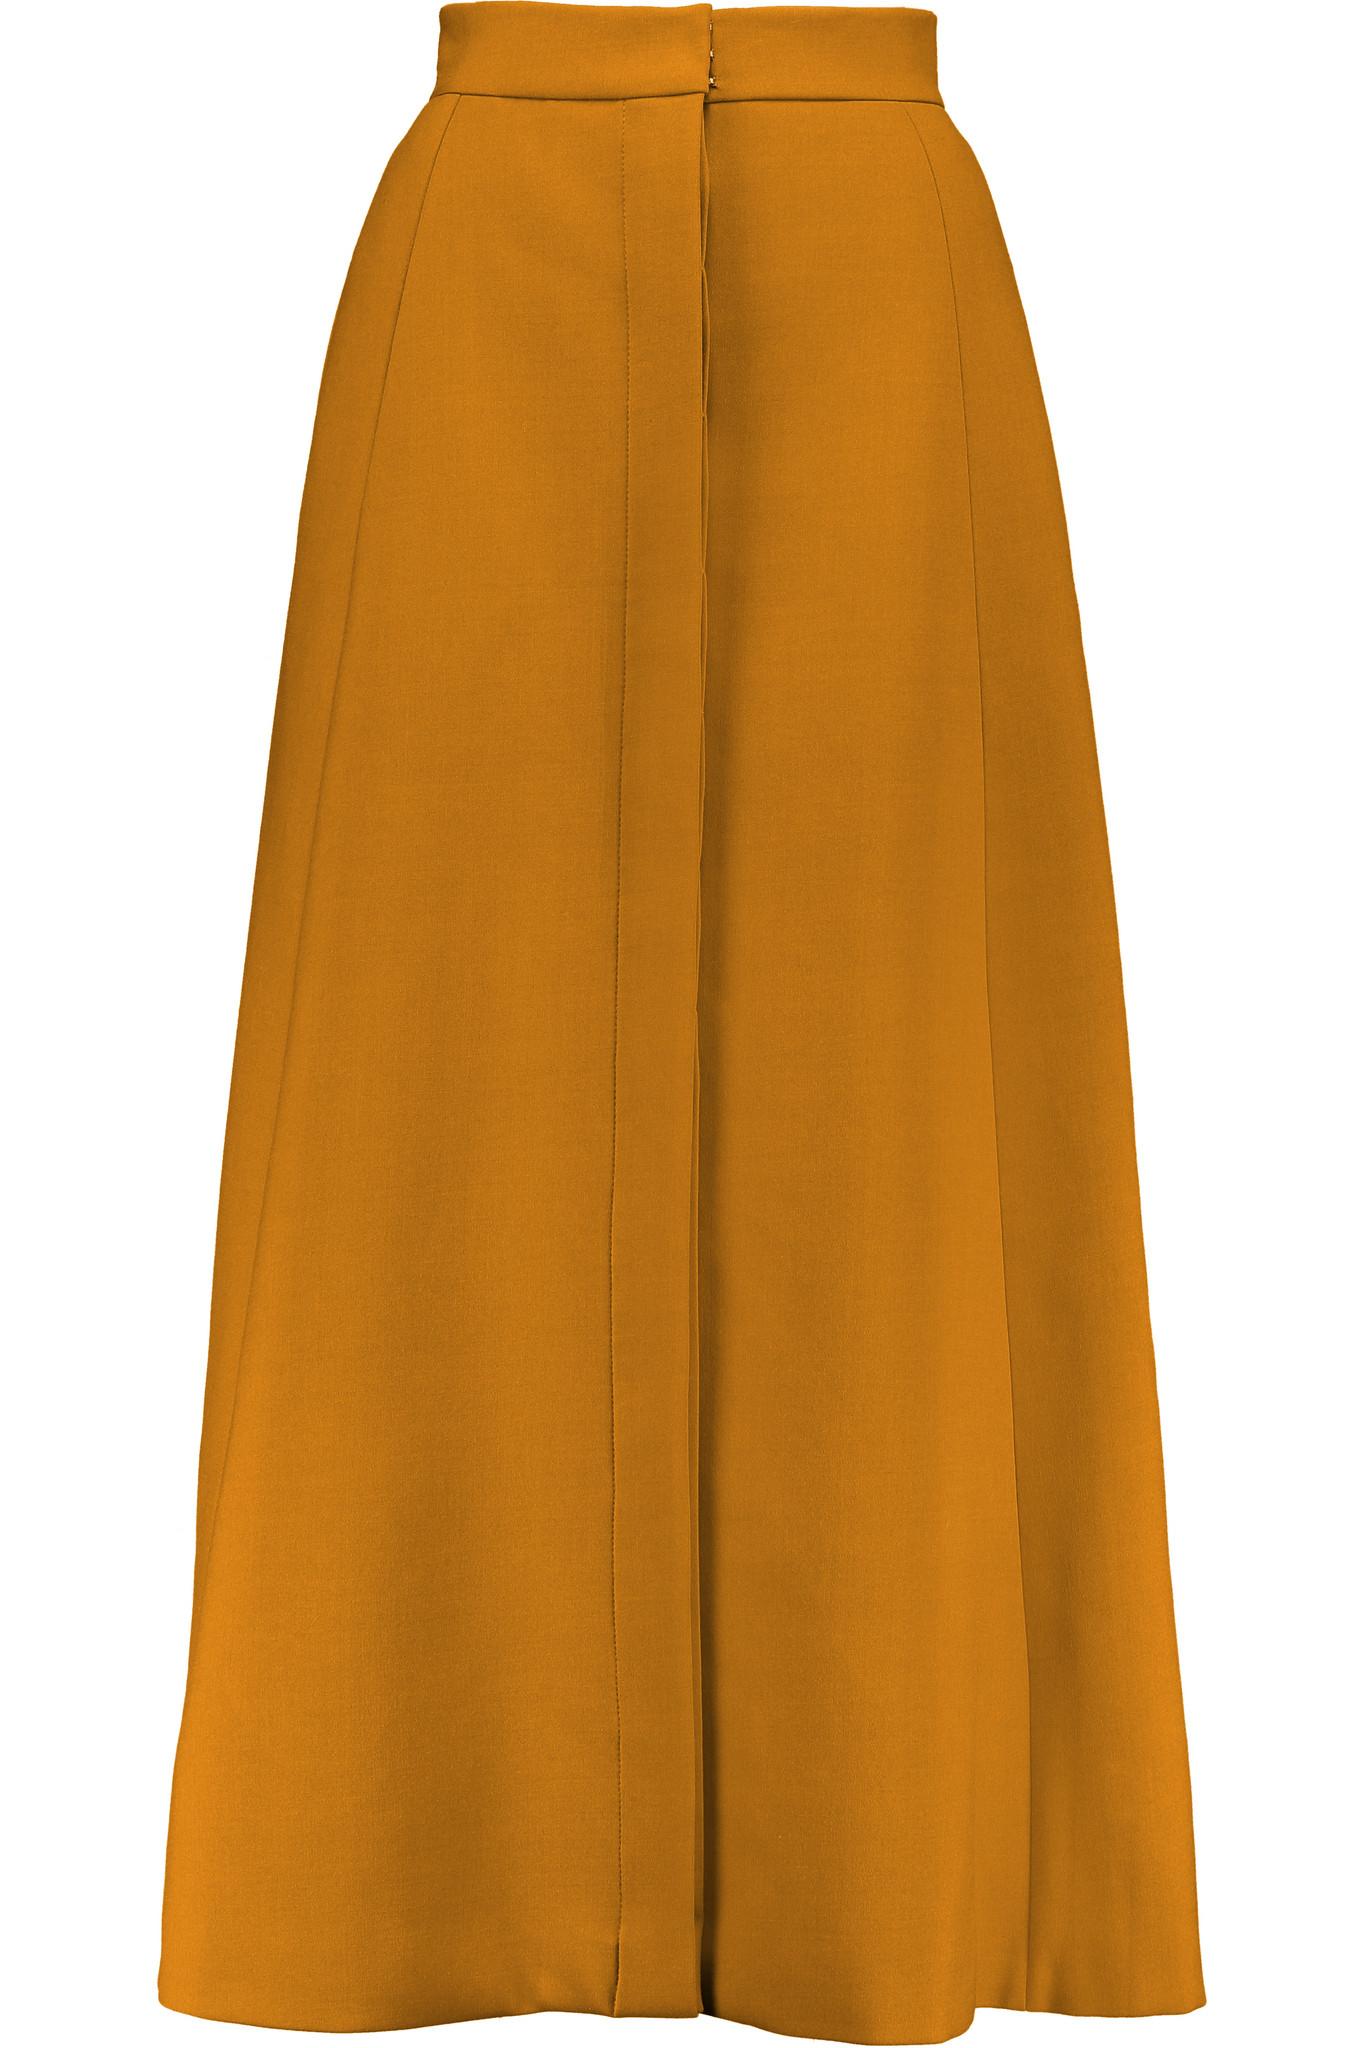 delpozo crepe twill midi skirt in brown lyst